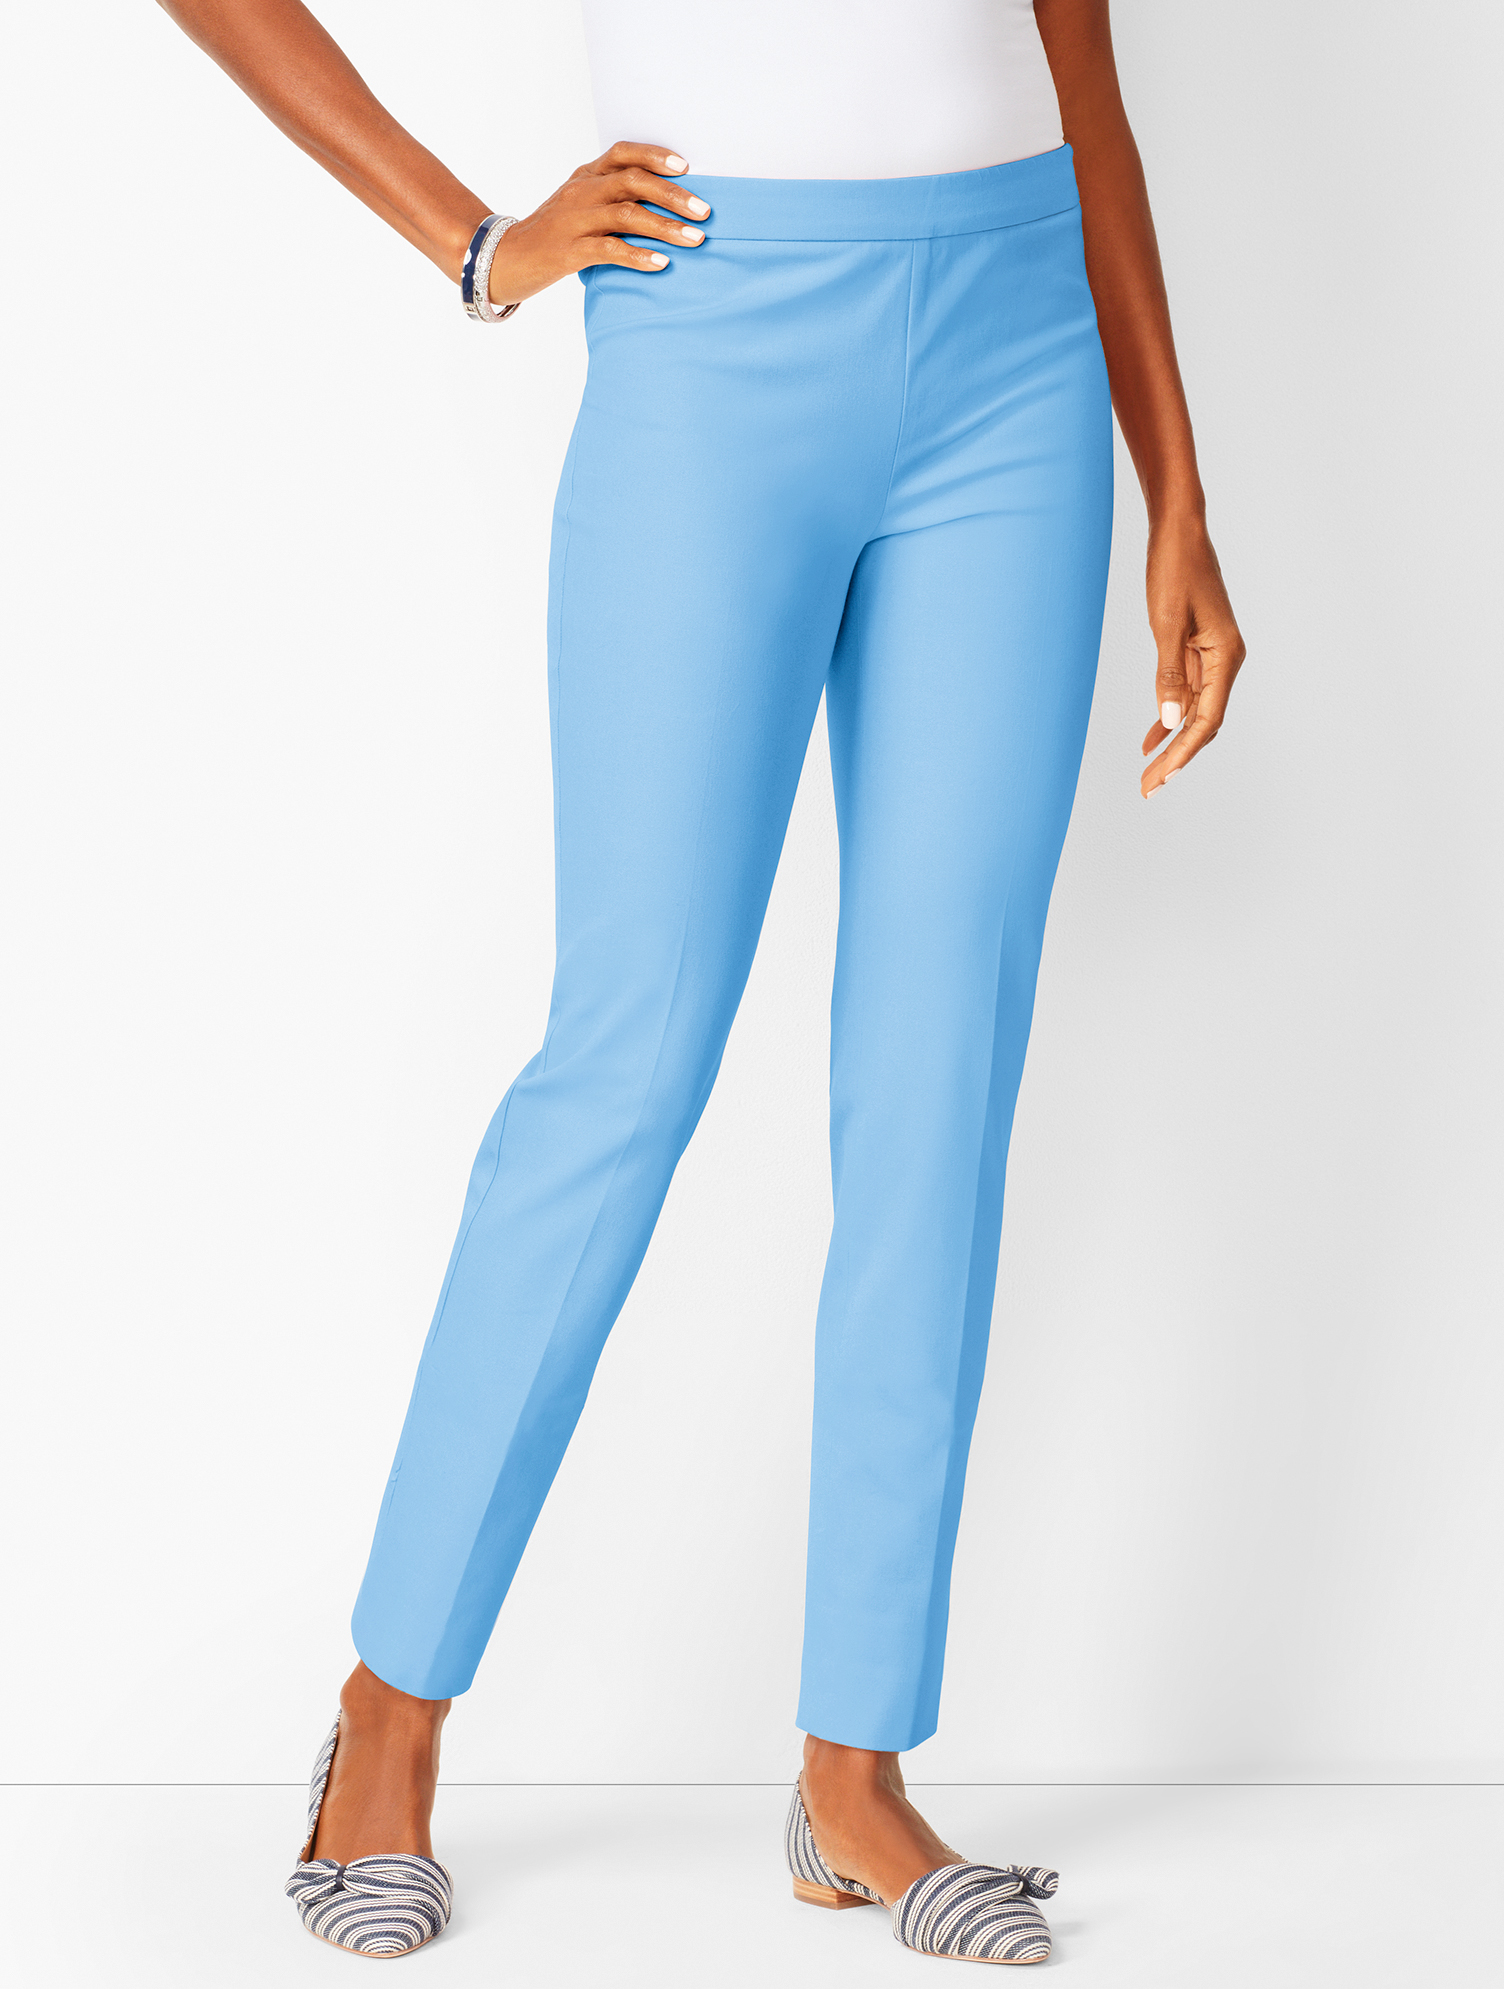 60s – 70s Pants, Jeans, Hippie, Bell Bottoms, Jumpsuits Chatham Ankle Pant Pants - Solid - COTE-BLUE - 16 - Talbots $89.50 AT vintagedancer.com